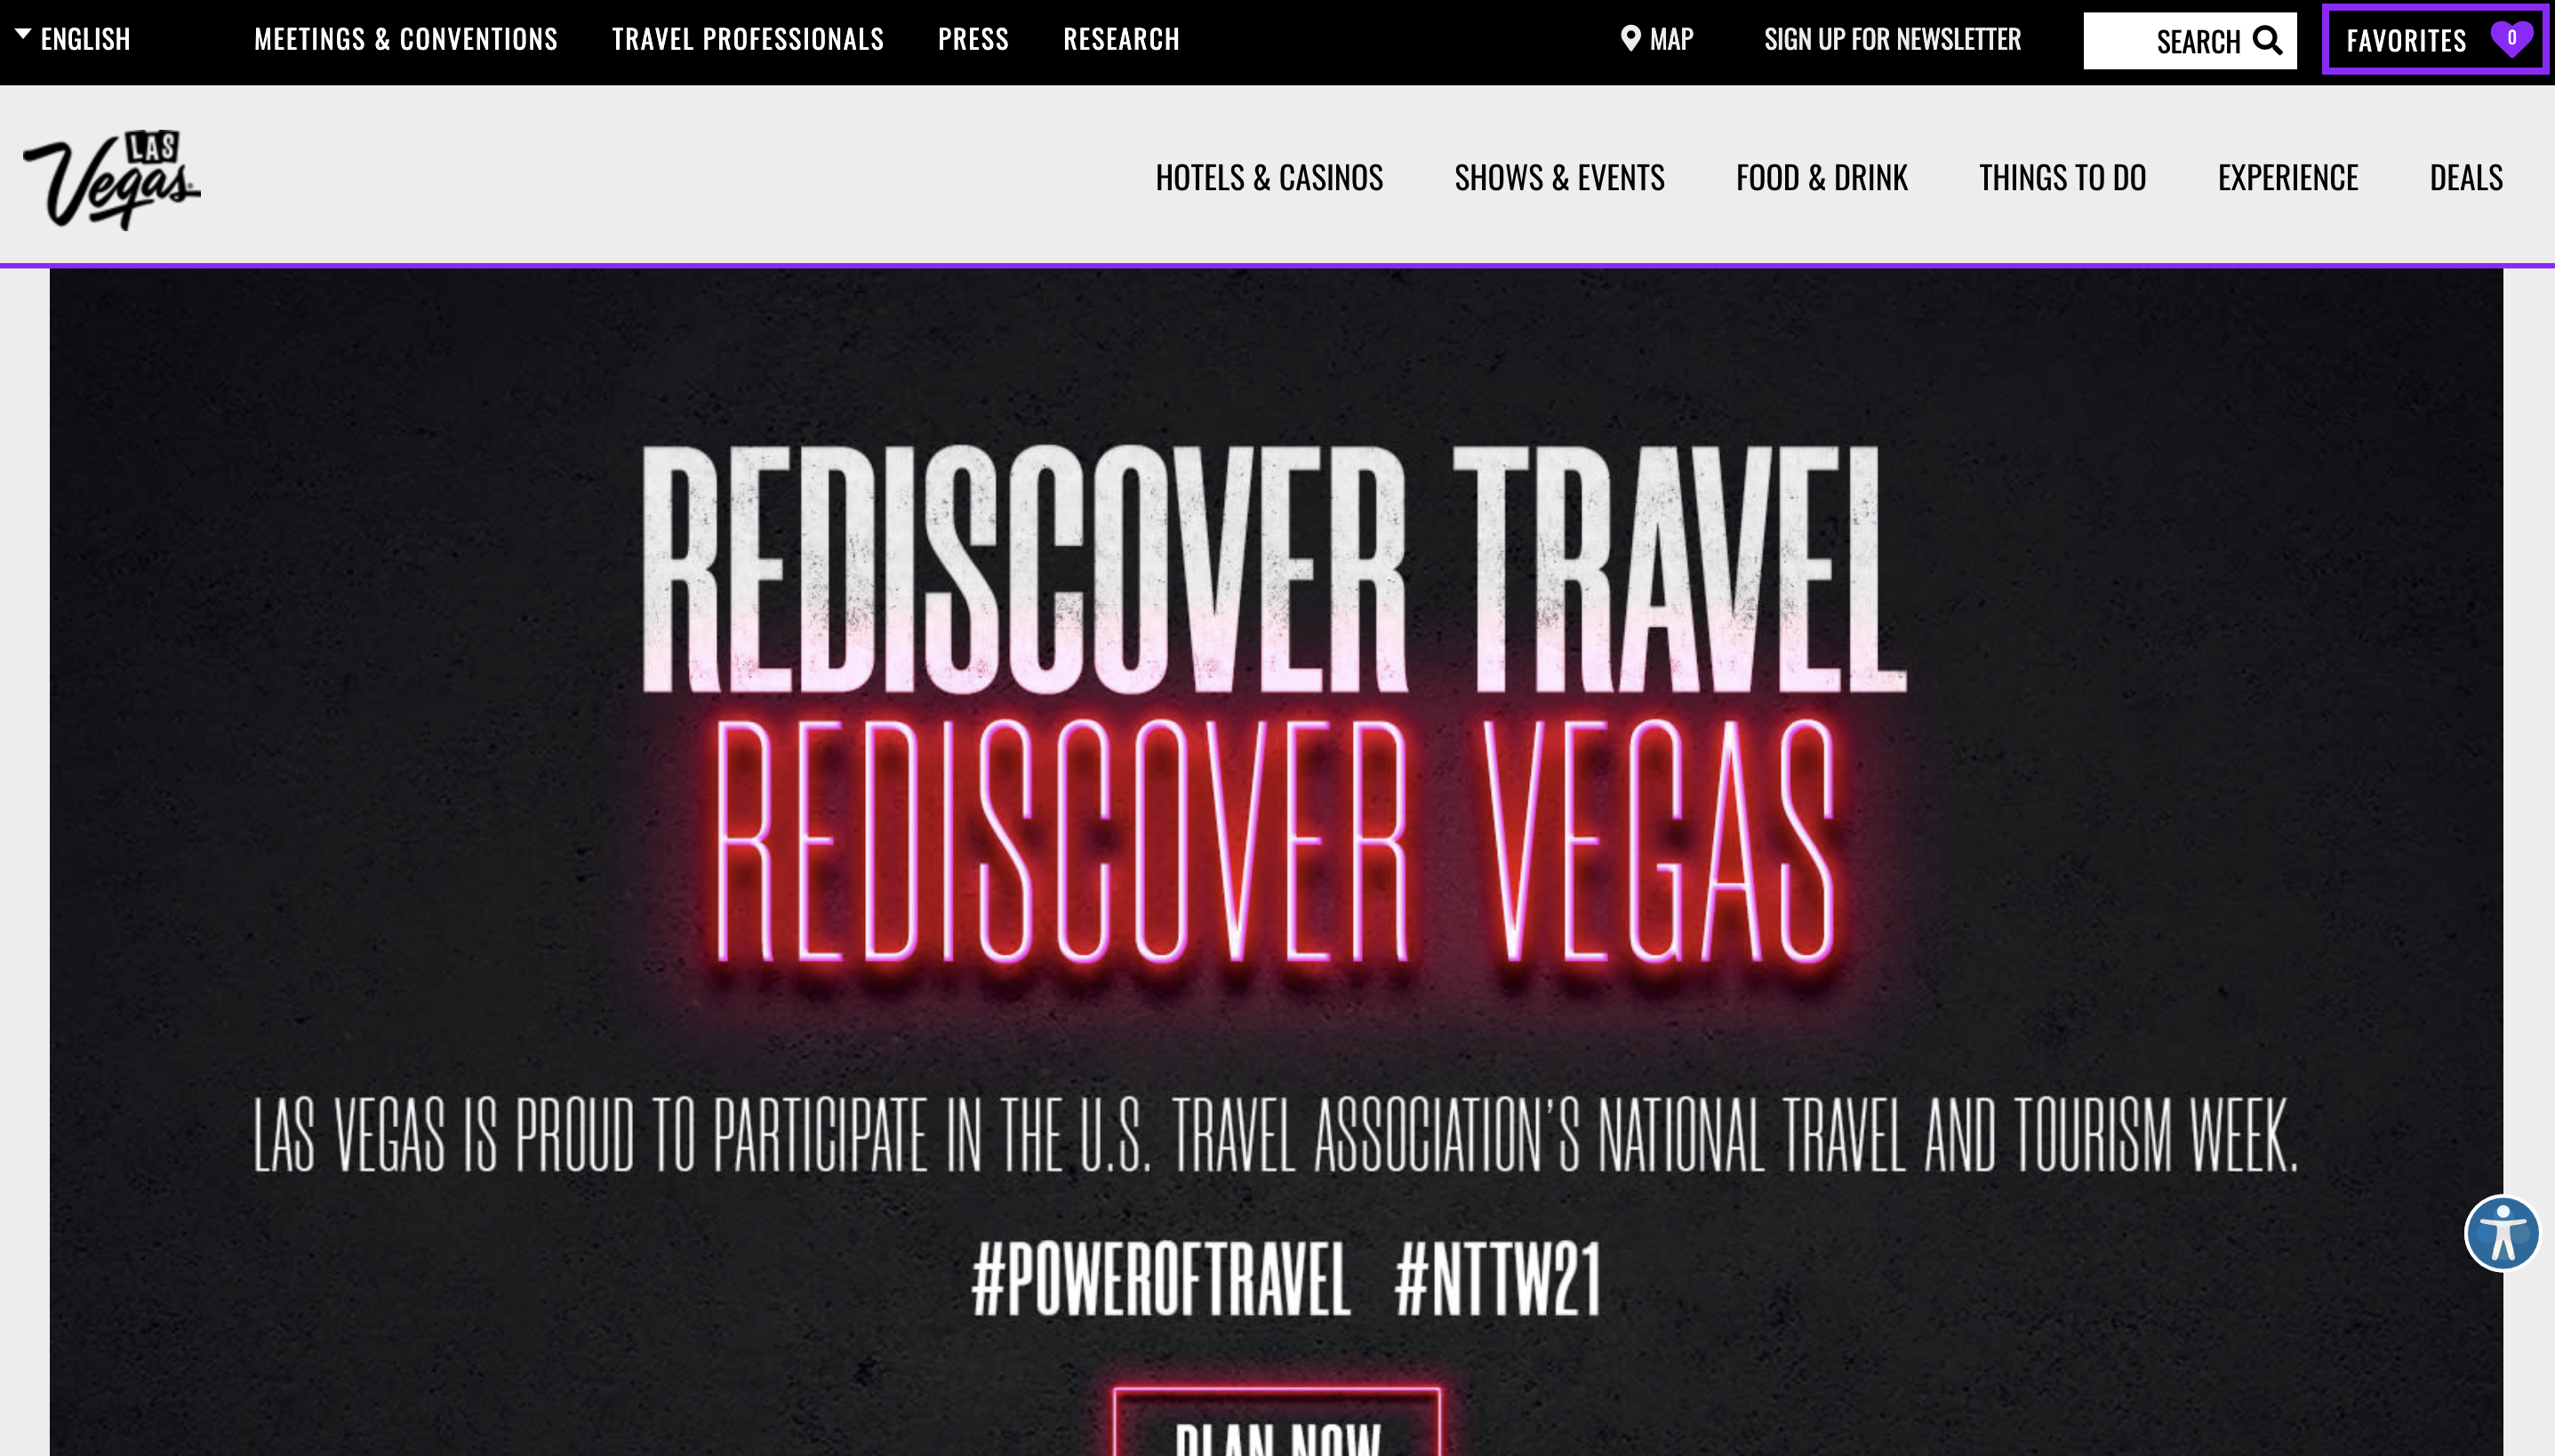 Visit Las Vegas Website